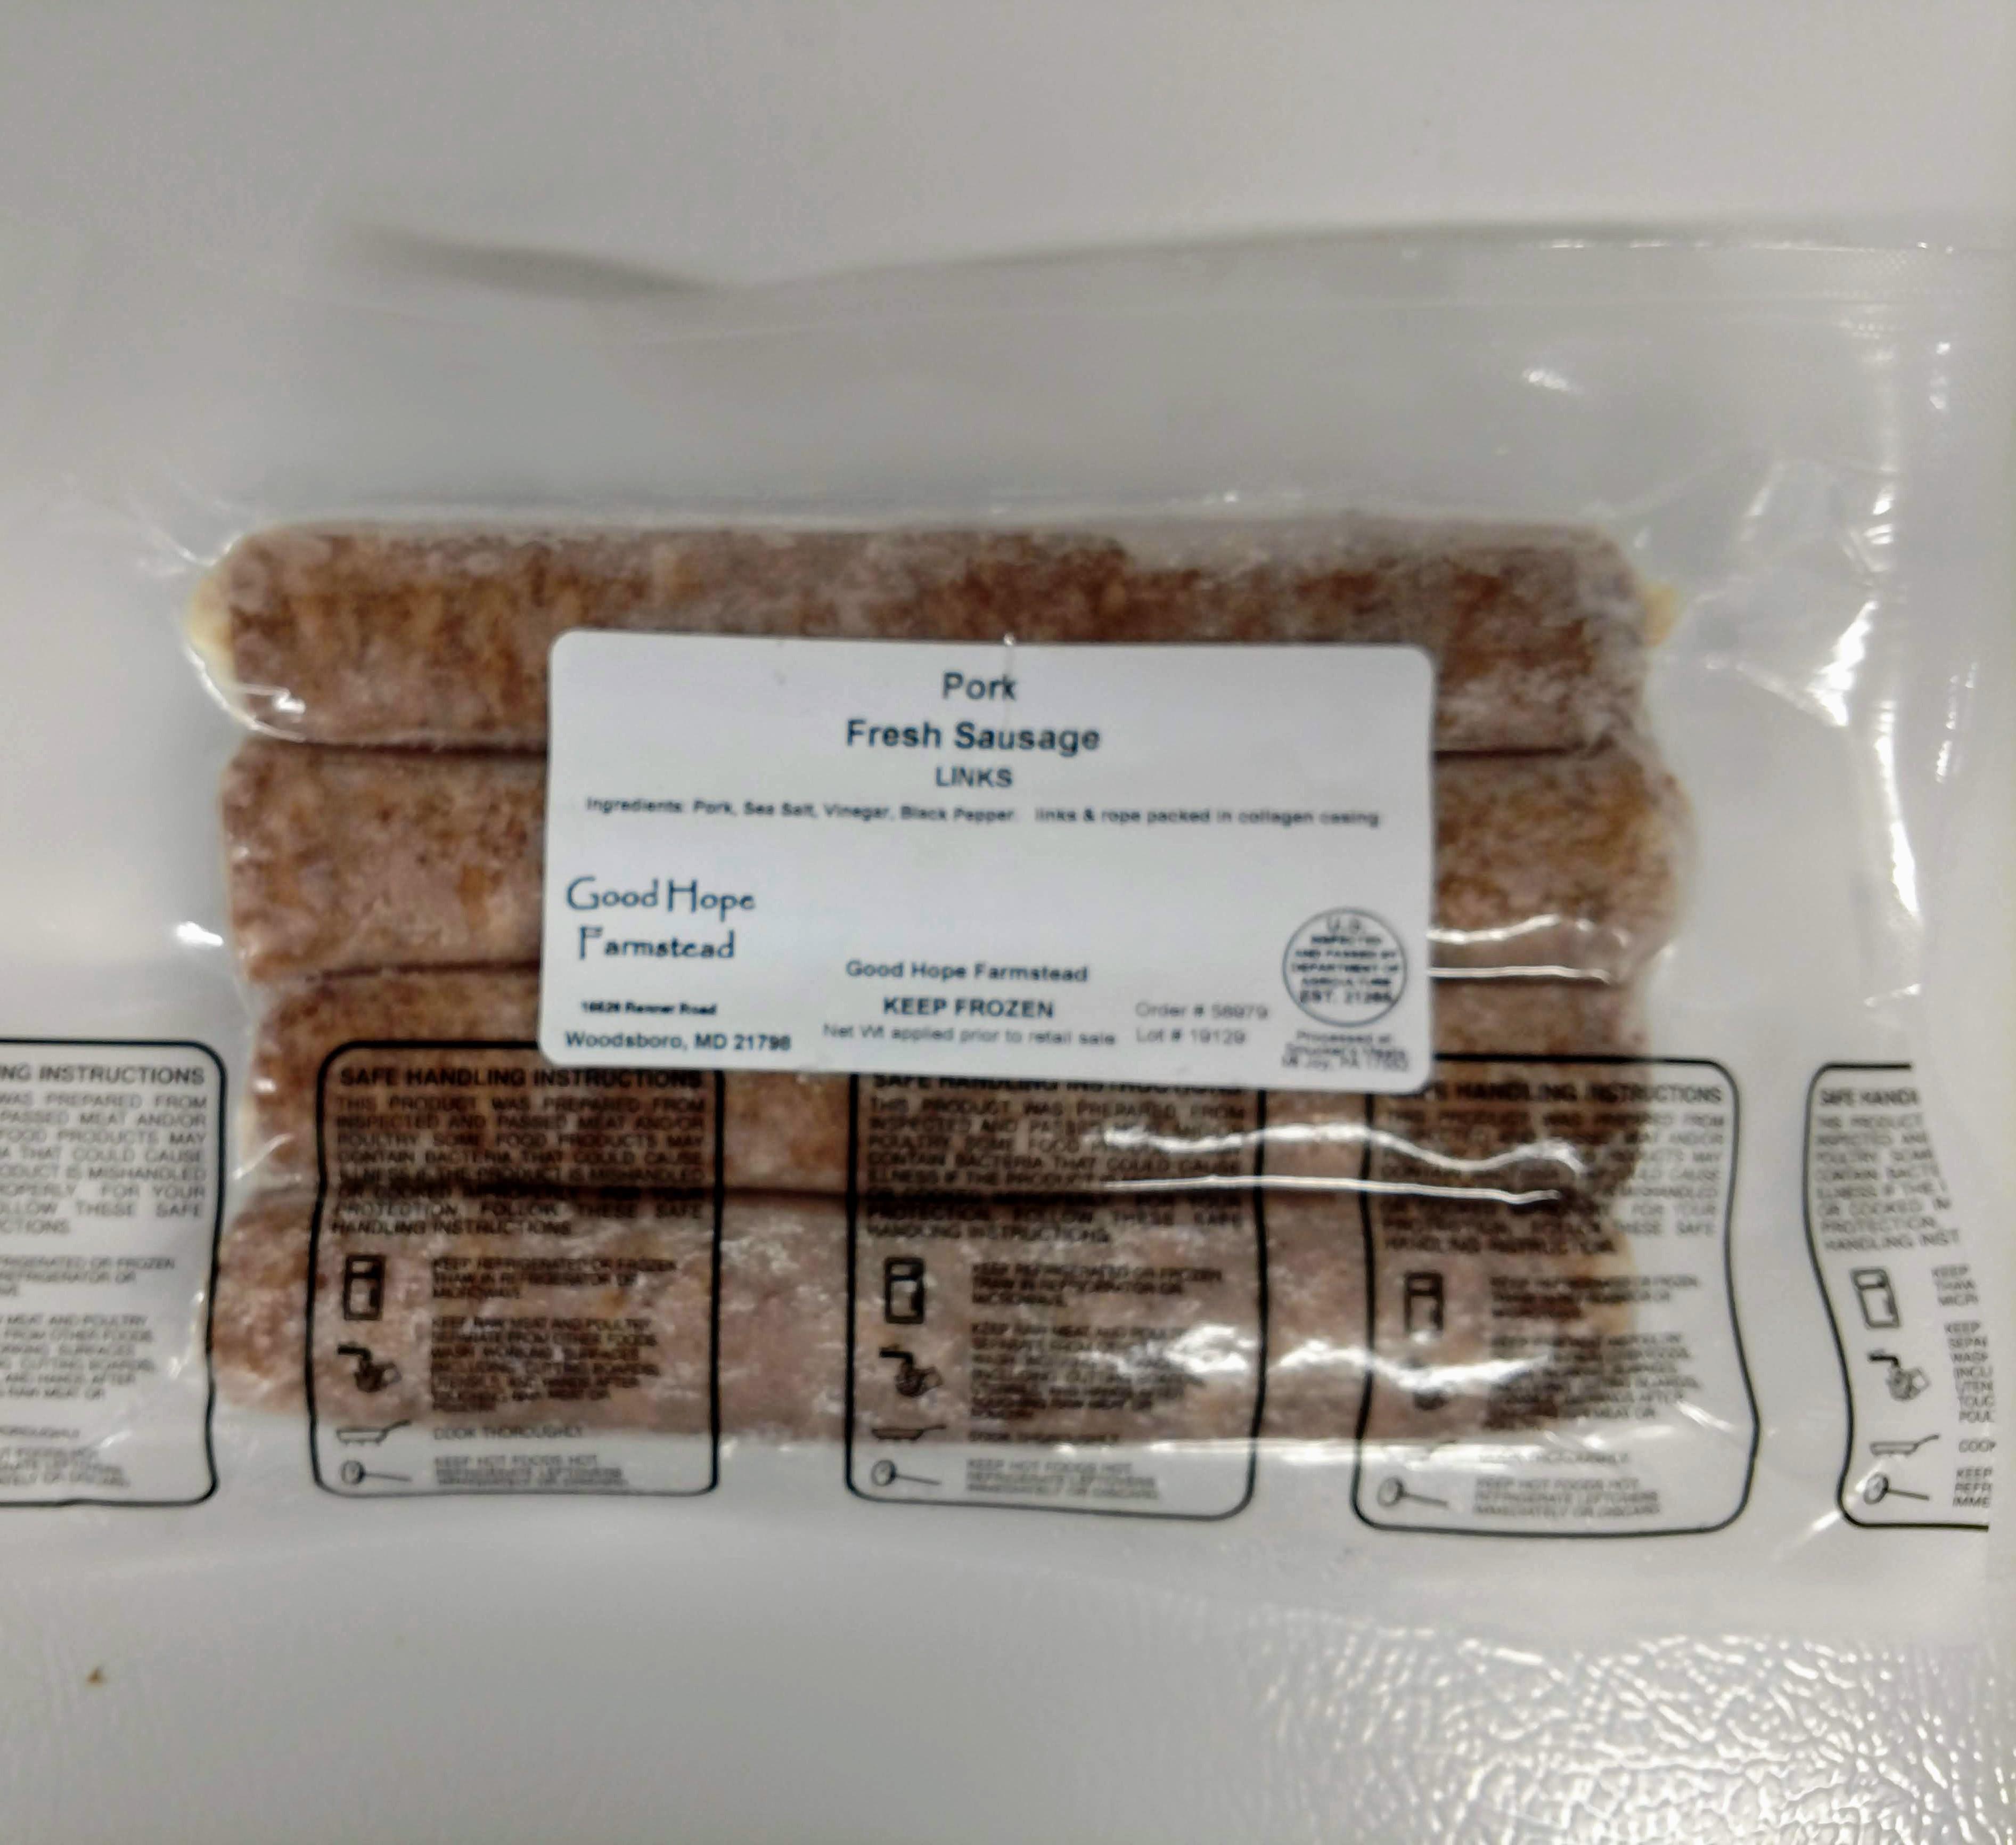 Fresh Sausage, Grillers, (SUGAR FREE) - Pork